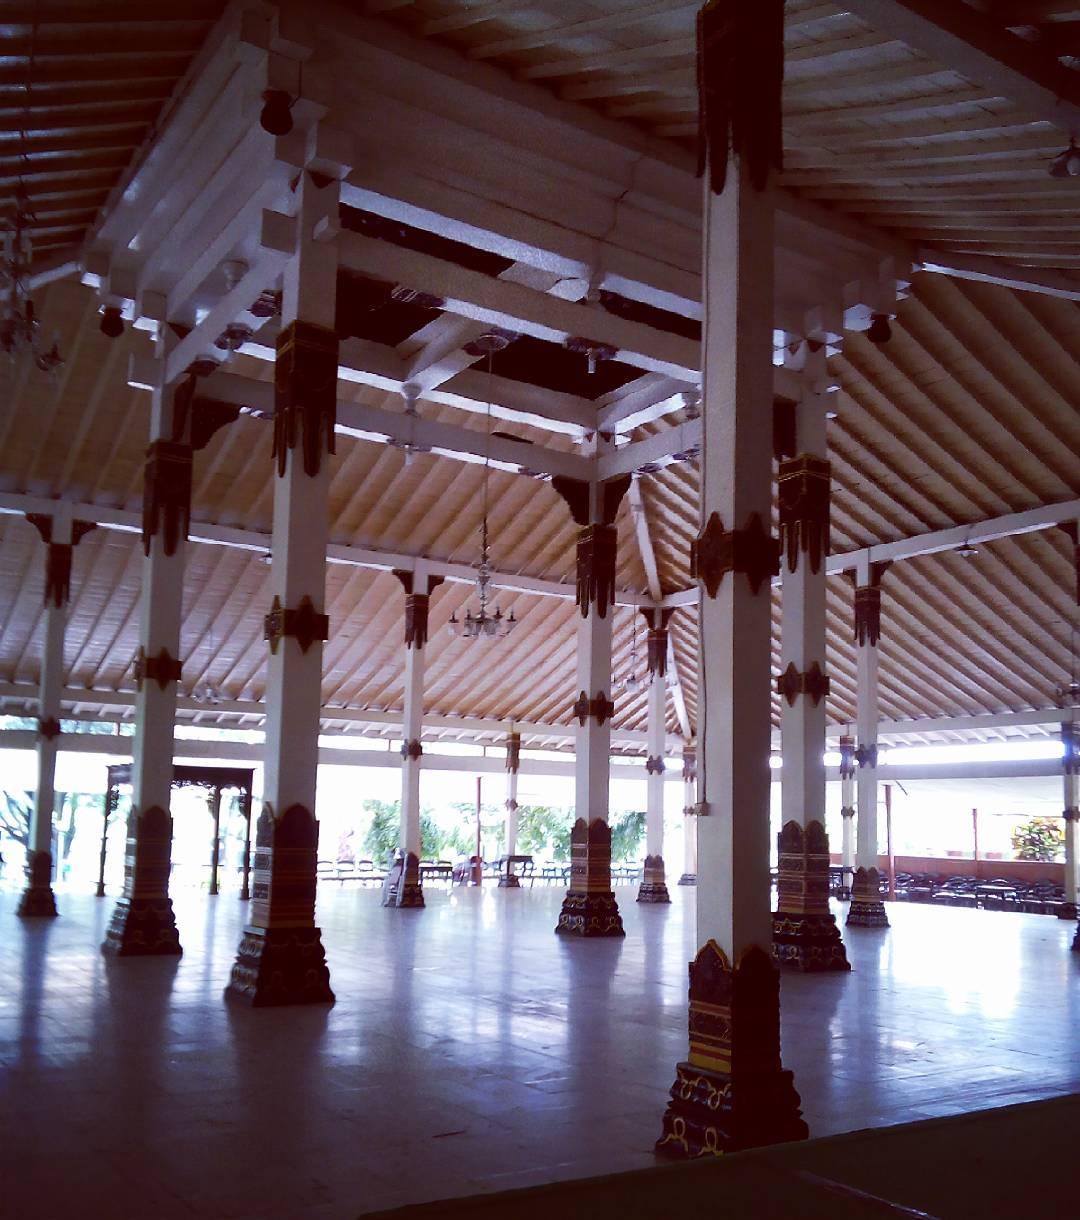 Monumen Sasana Wiratama Diponegoro Menilik Kisah Perjuangan Pangeran Tugu Wisata